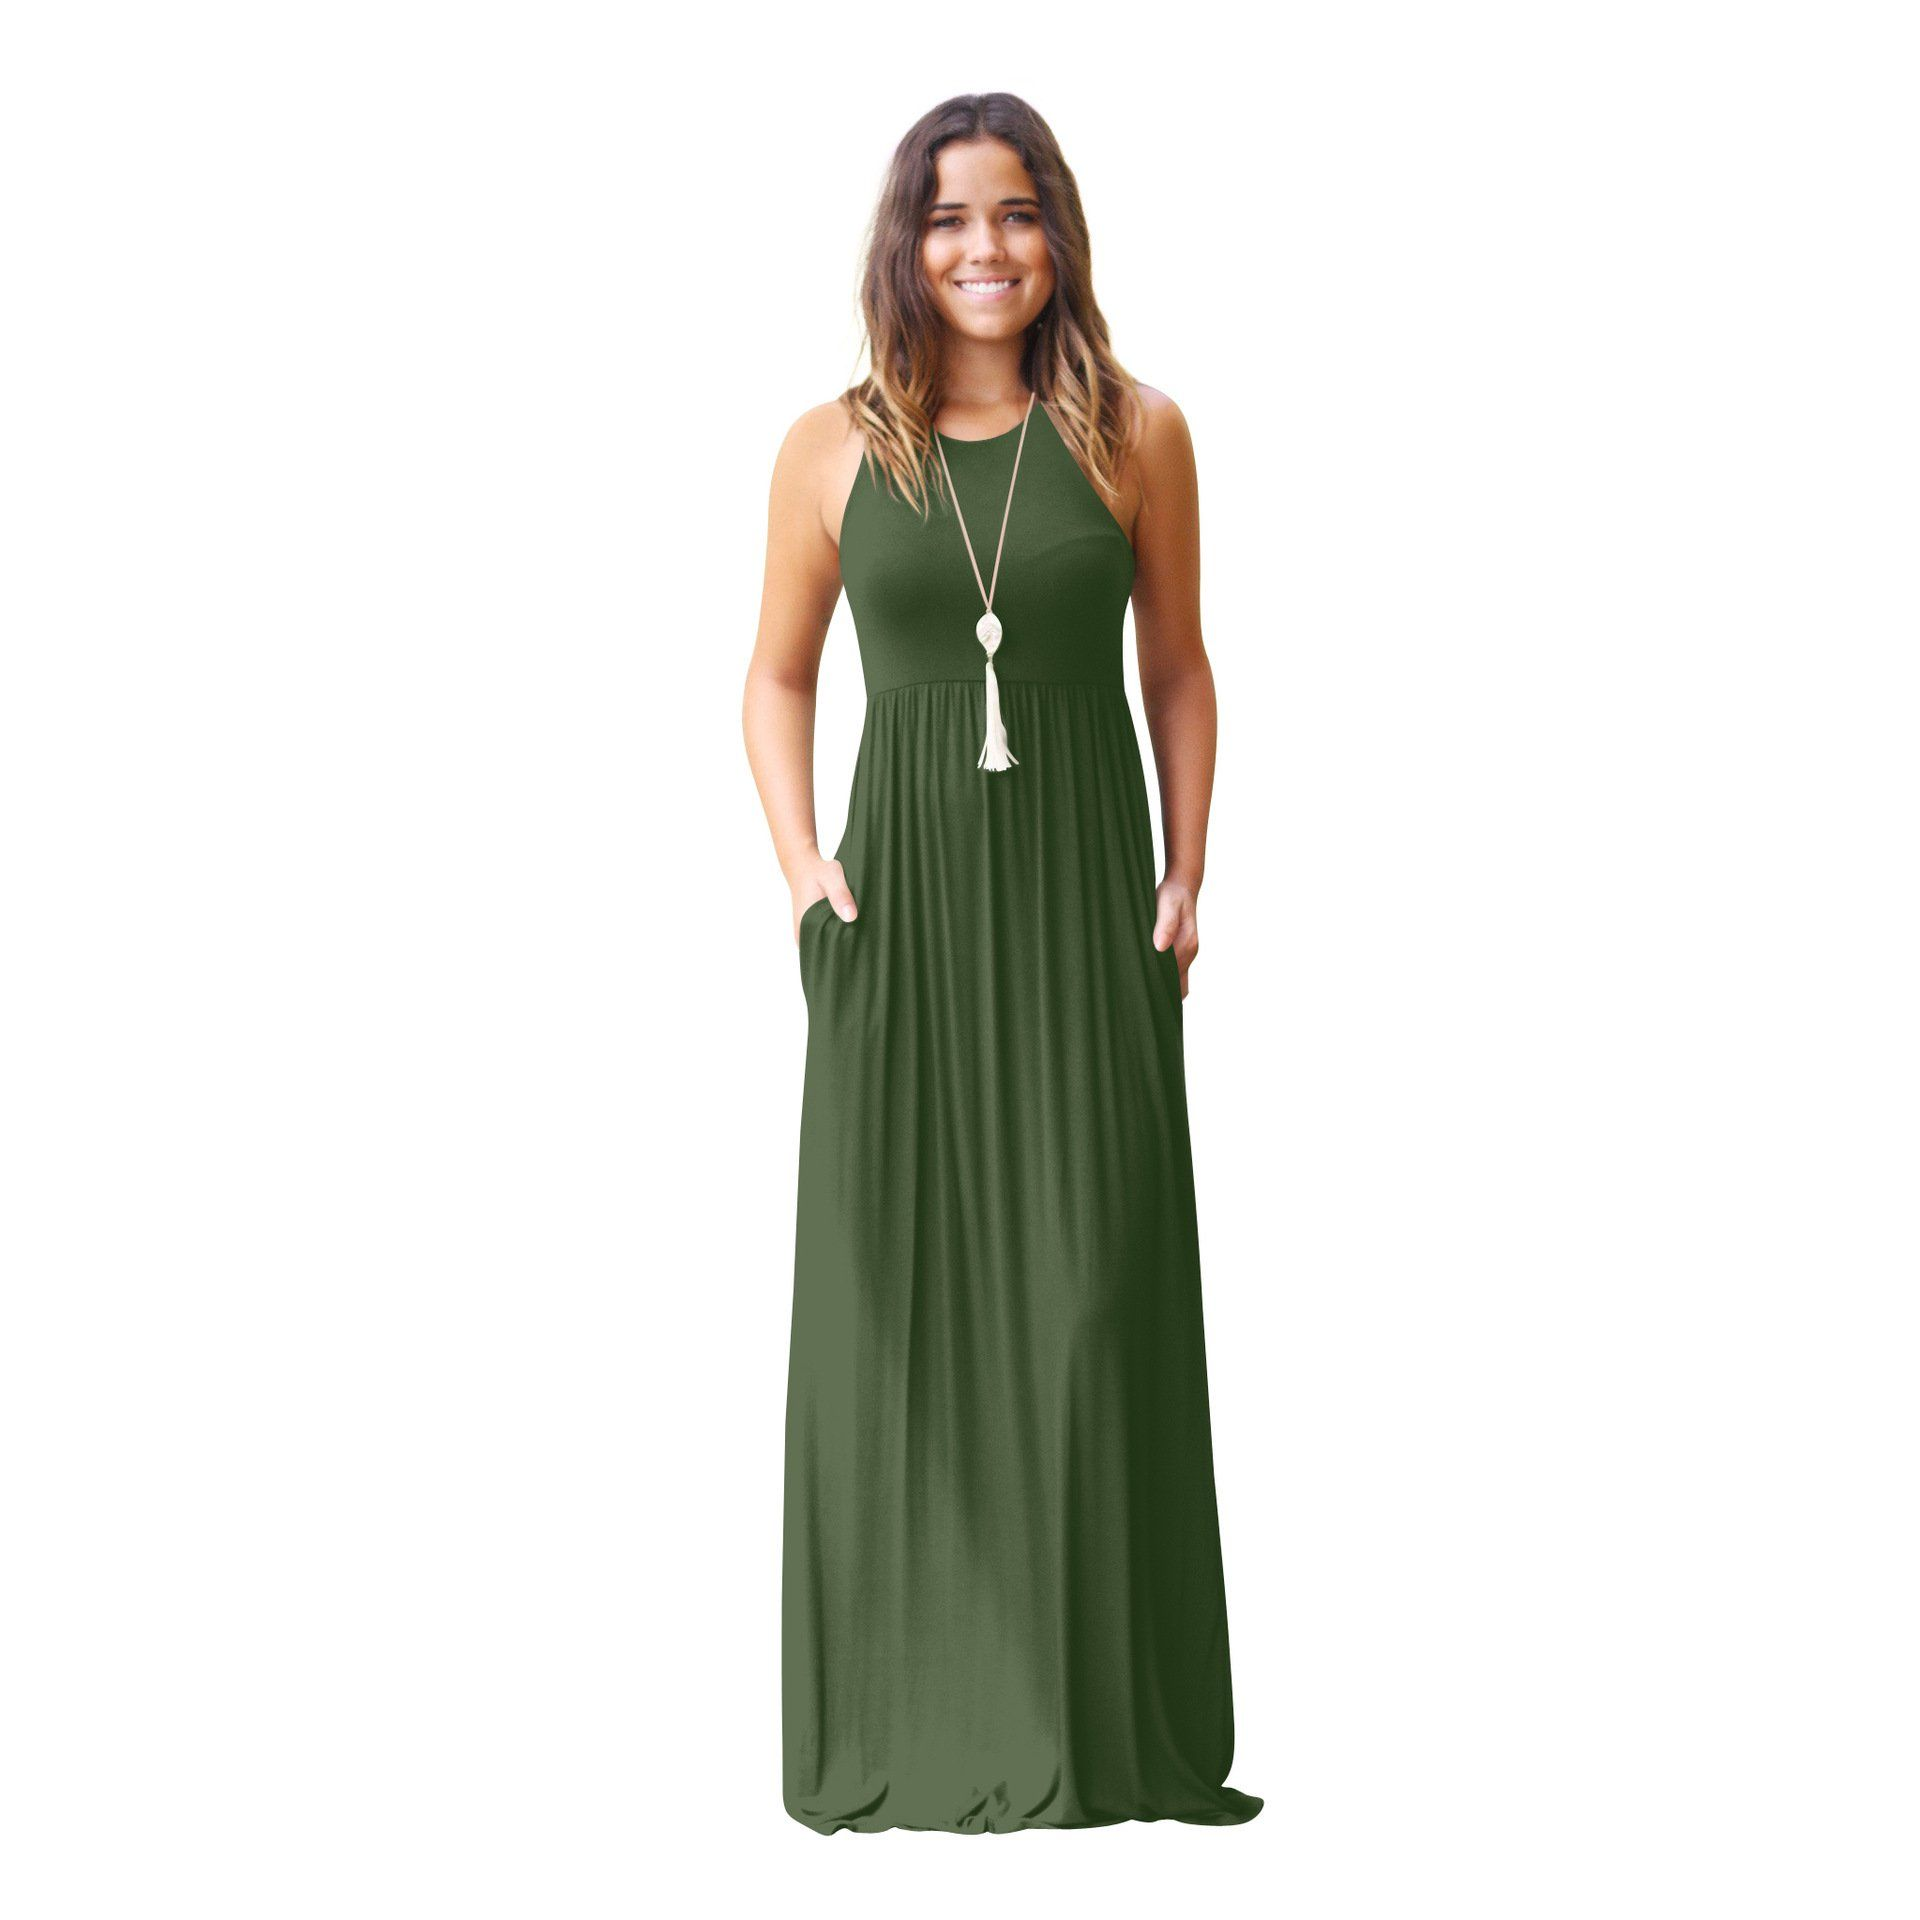 Side New Fashion Women S Casual Plain Sleeveless Vest Dress Strap Pocket Dress Walmart Com In 2021 Short Sleeve Maxi Dresses Long Dress Casual Maxi Dress With Sleeves [ 1920 x 1920 Pixel ]